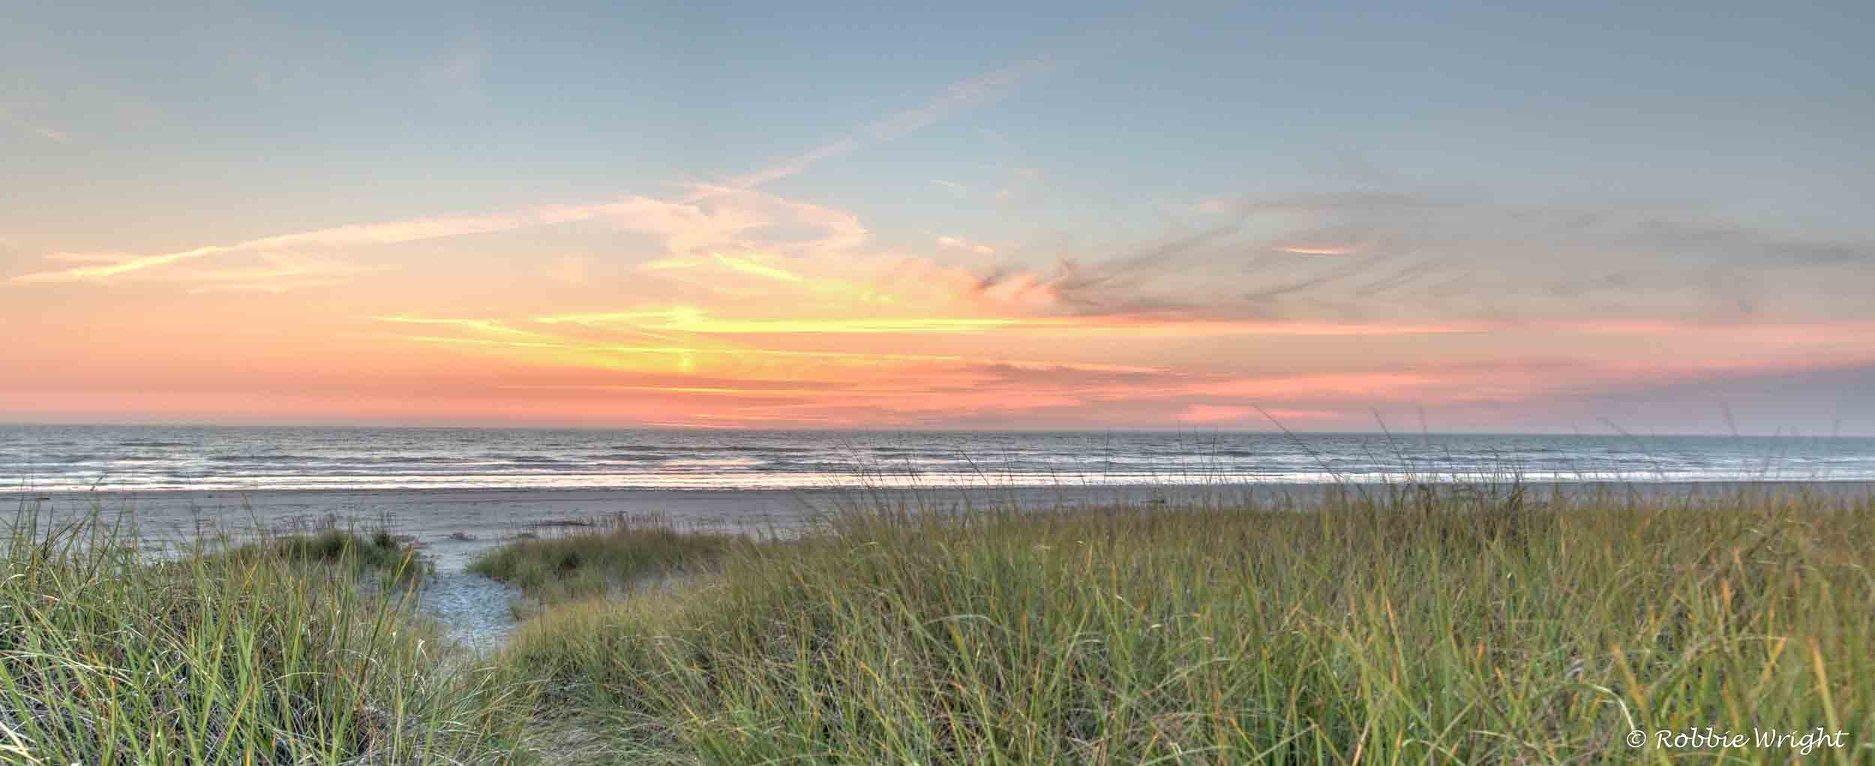 Bloomer Estates Vacation Rentals Property Management Long Beach Peninsula Area Seaview Washington